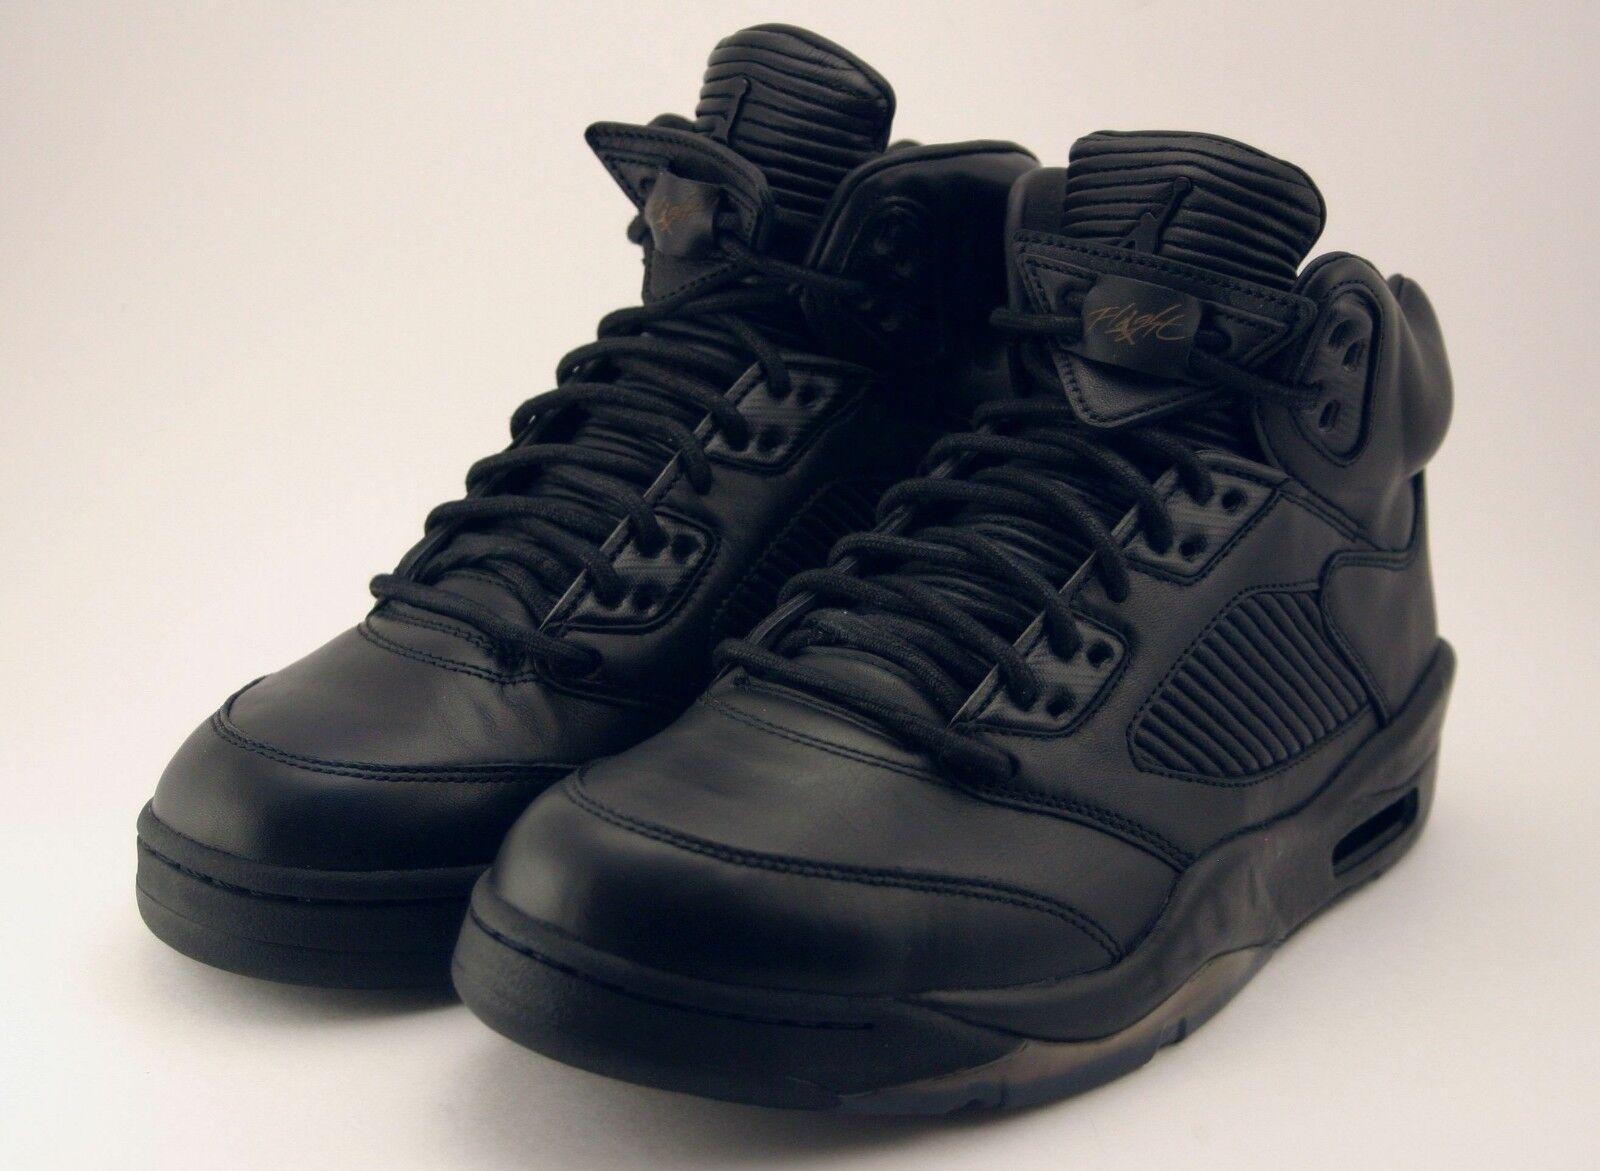 Nike Air Jordan 5 Retro Premium Triple Black Leather LUX 881432-010 Size 9.5 DS